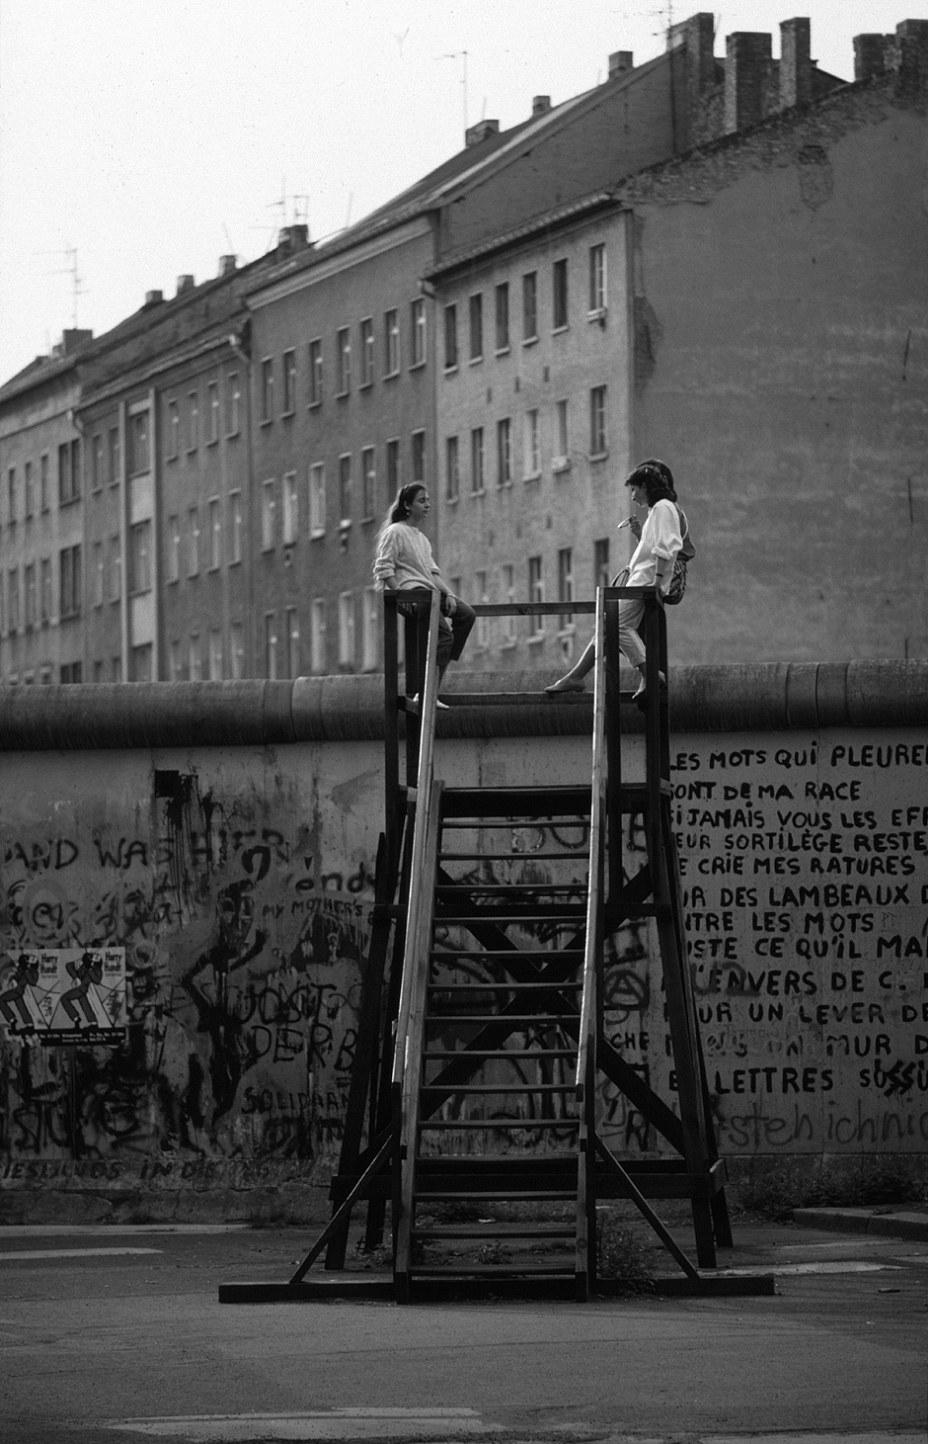 Le même gris entre Kreuzberg et Berlin-Mitte / Das gleiche Grau zwischen Kreuzberg und Berlin-Mitte... Foto: (c) Michael Magercord / ROPI